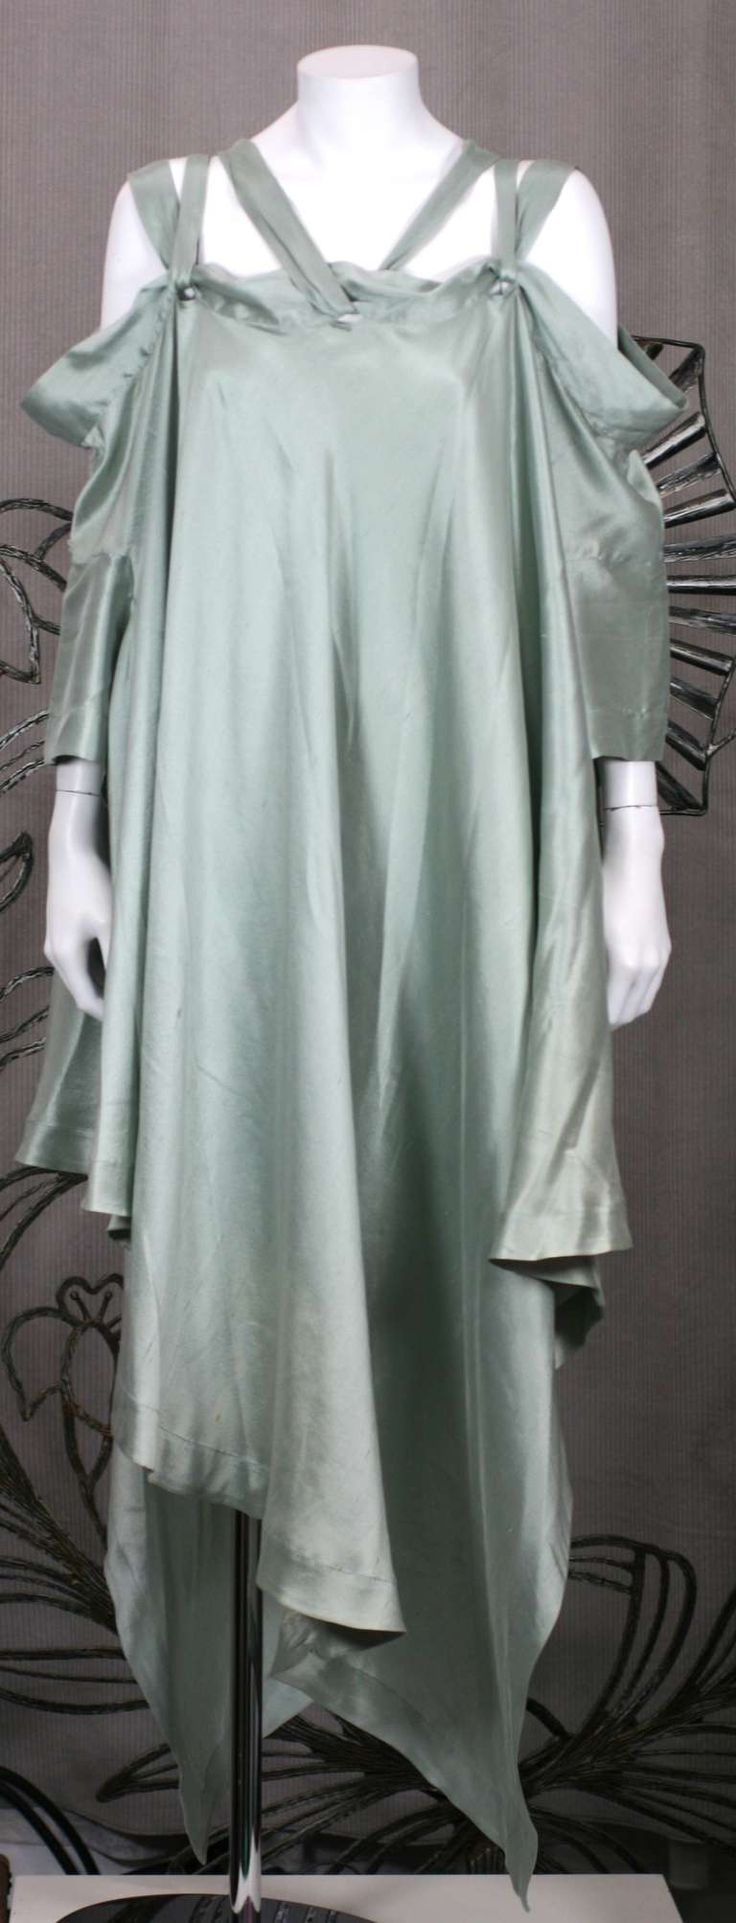 Romeo Gigli Celadon Silk Scarf Dress image 2